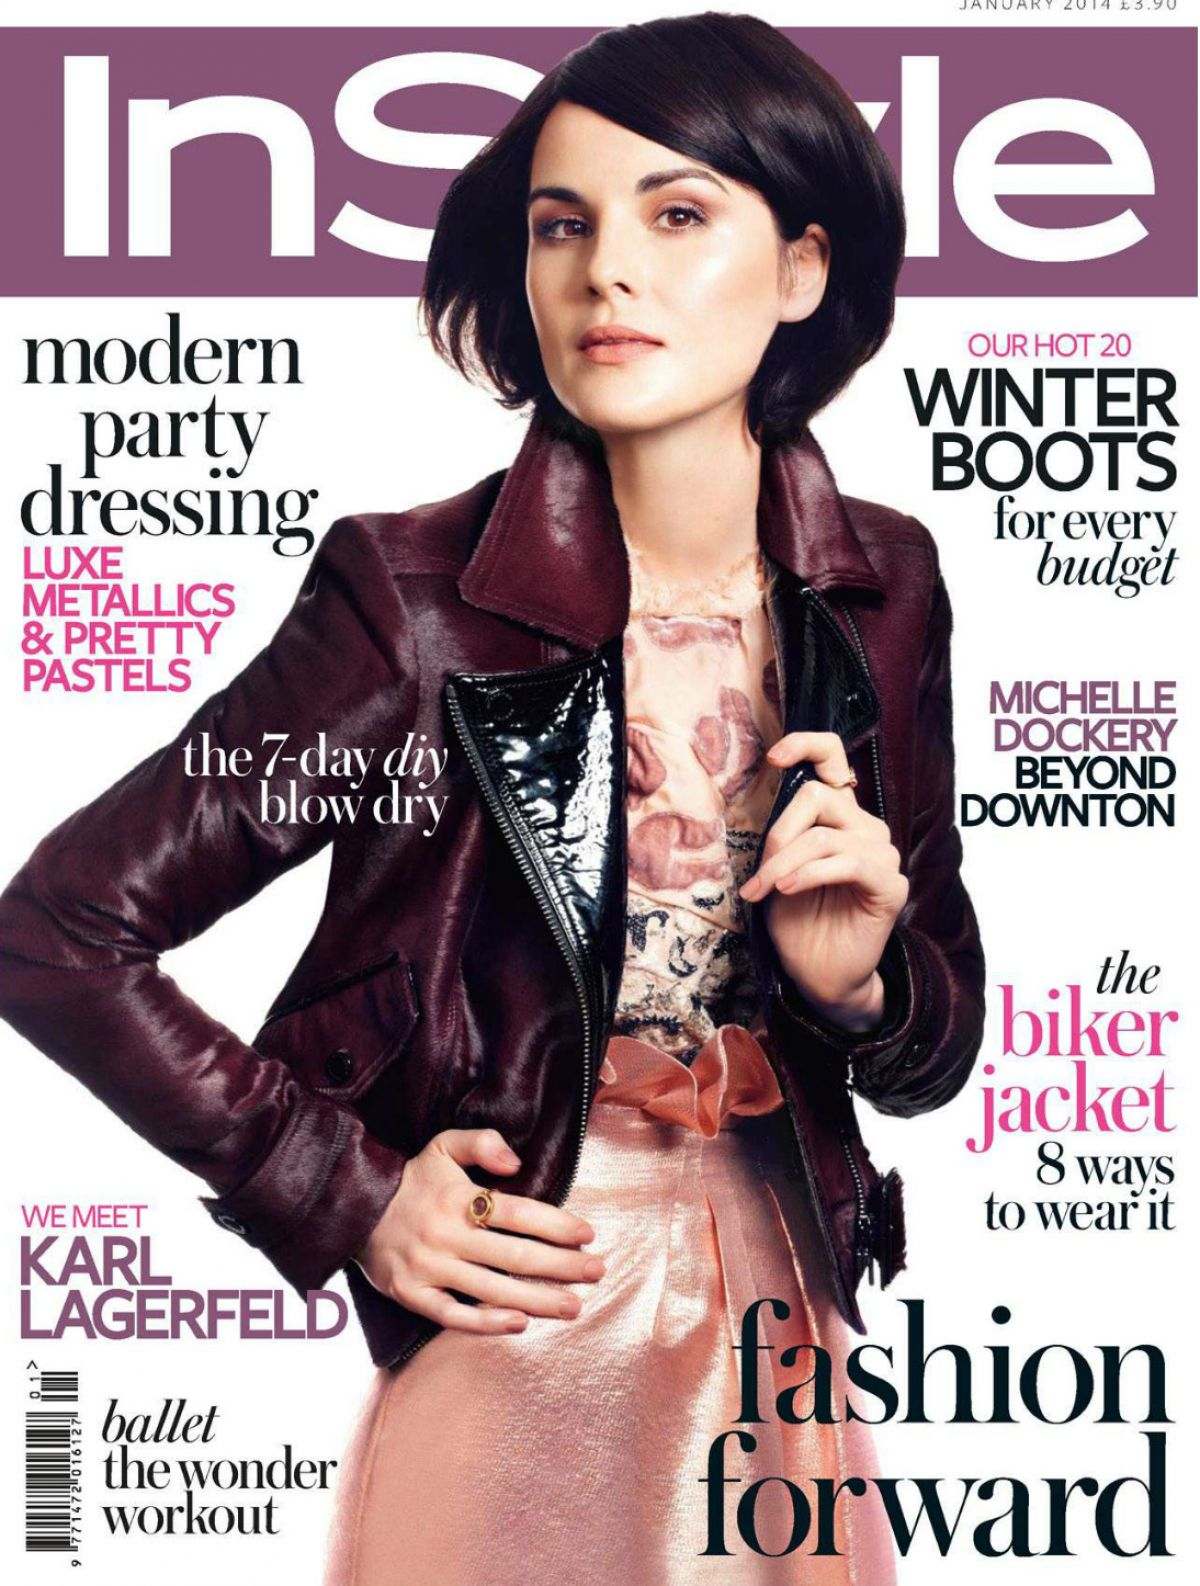 MICHELLE DOCKERY In Instyle Magazine, UK January 2014